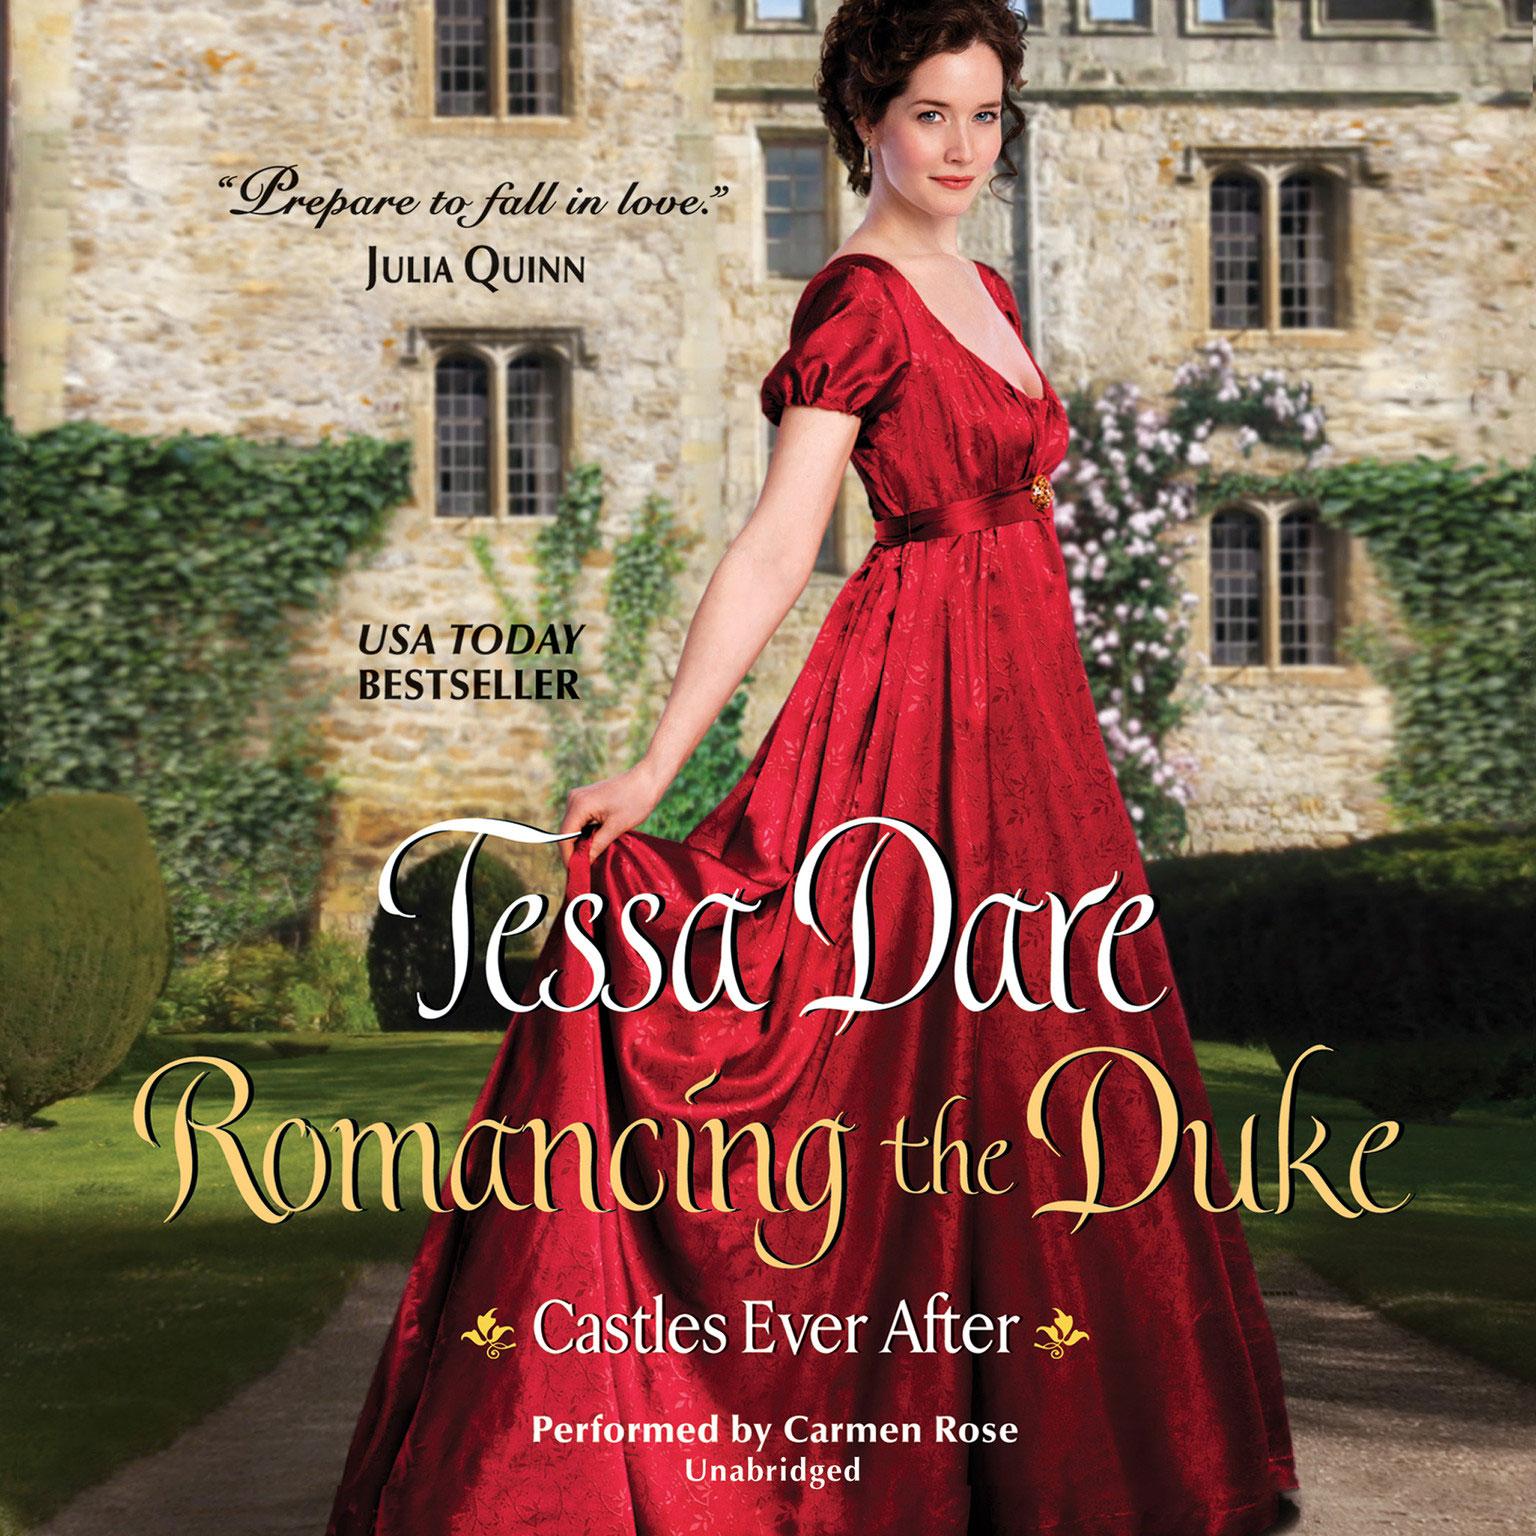 Romancing The Duke